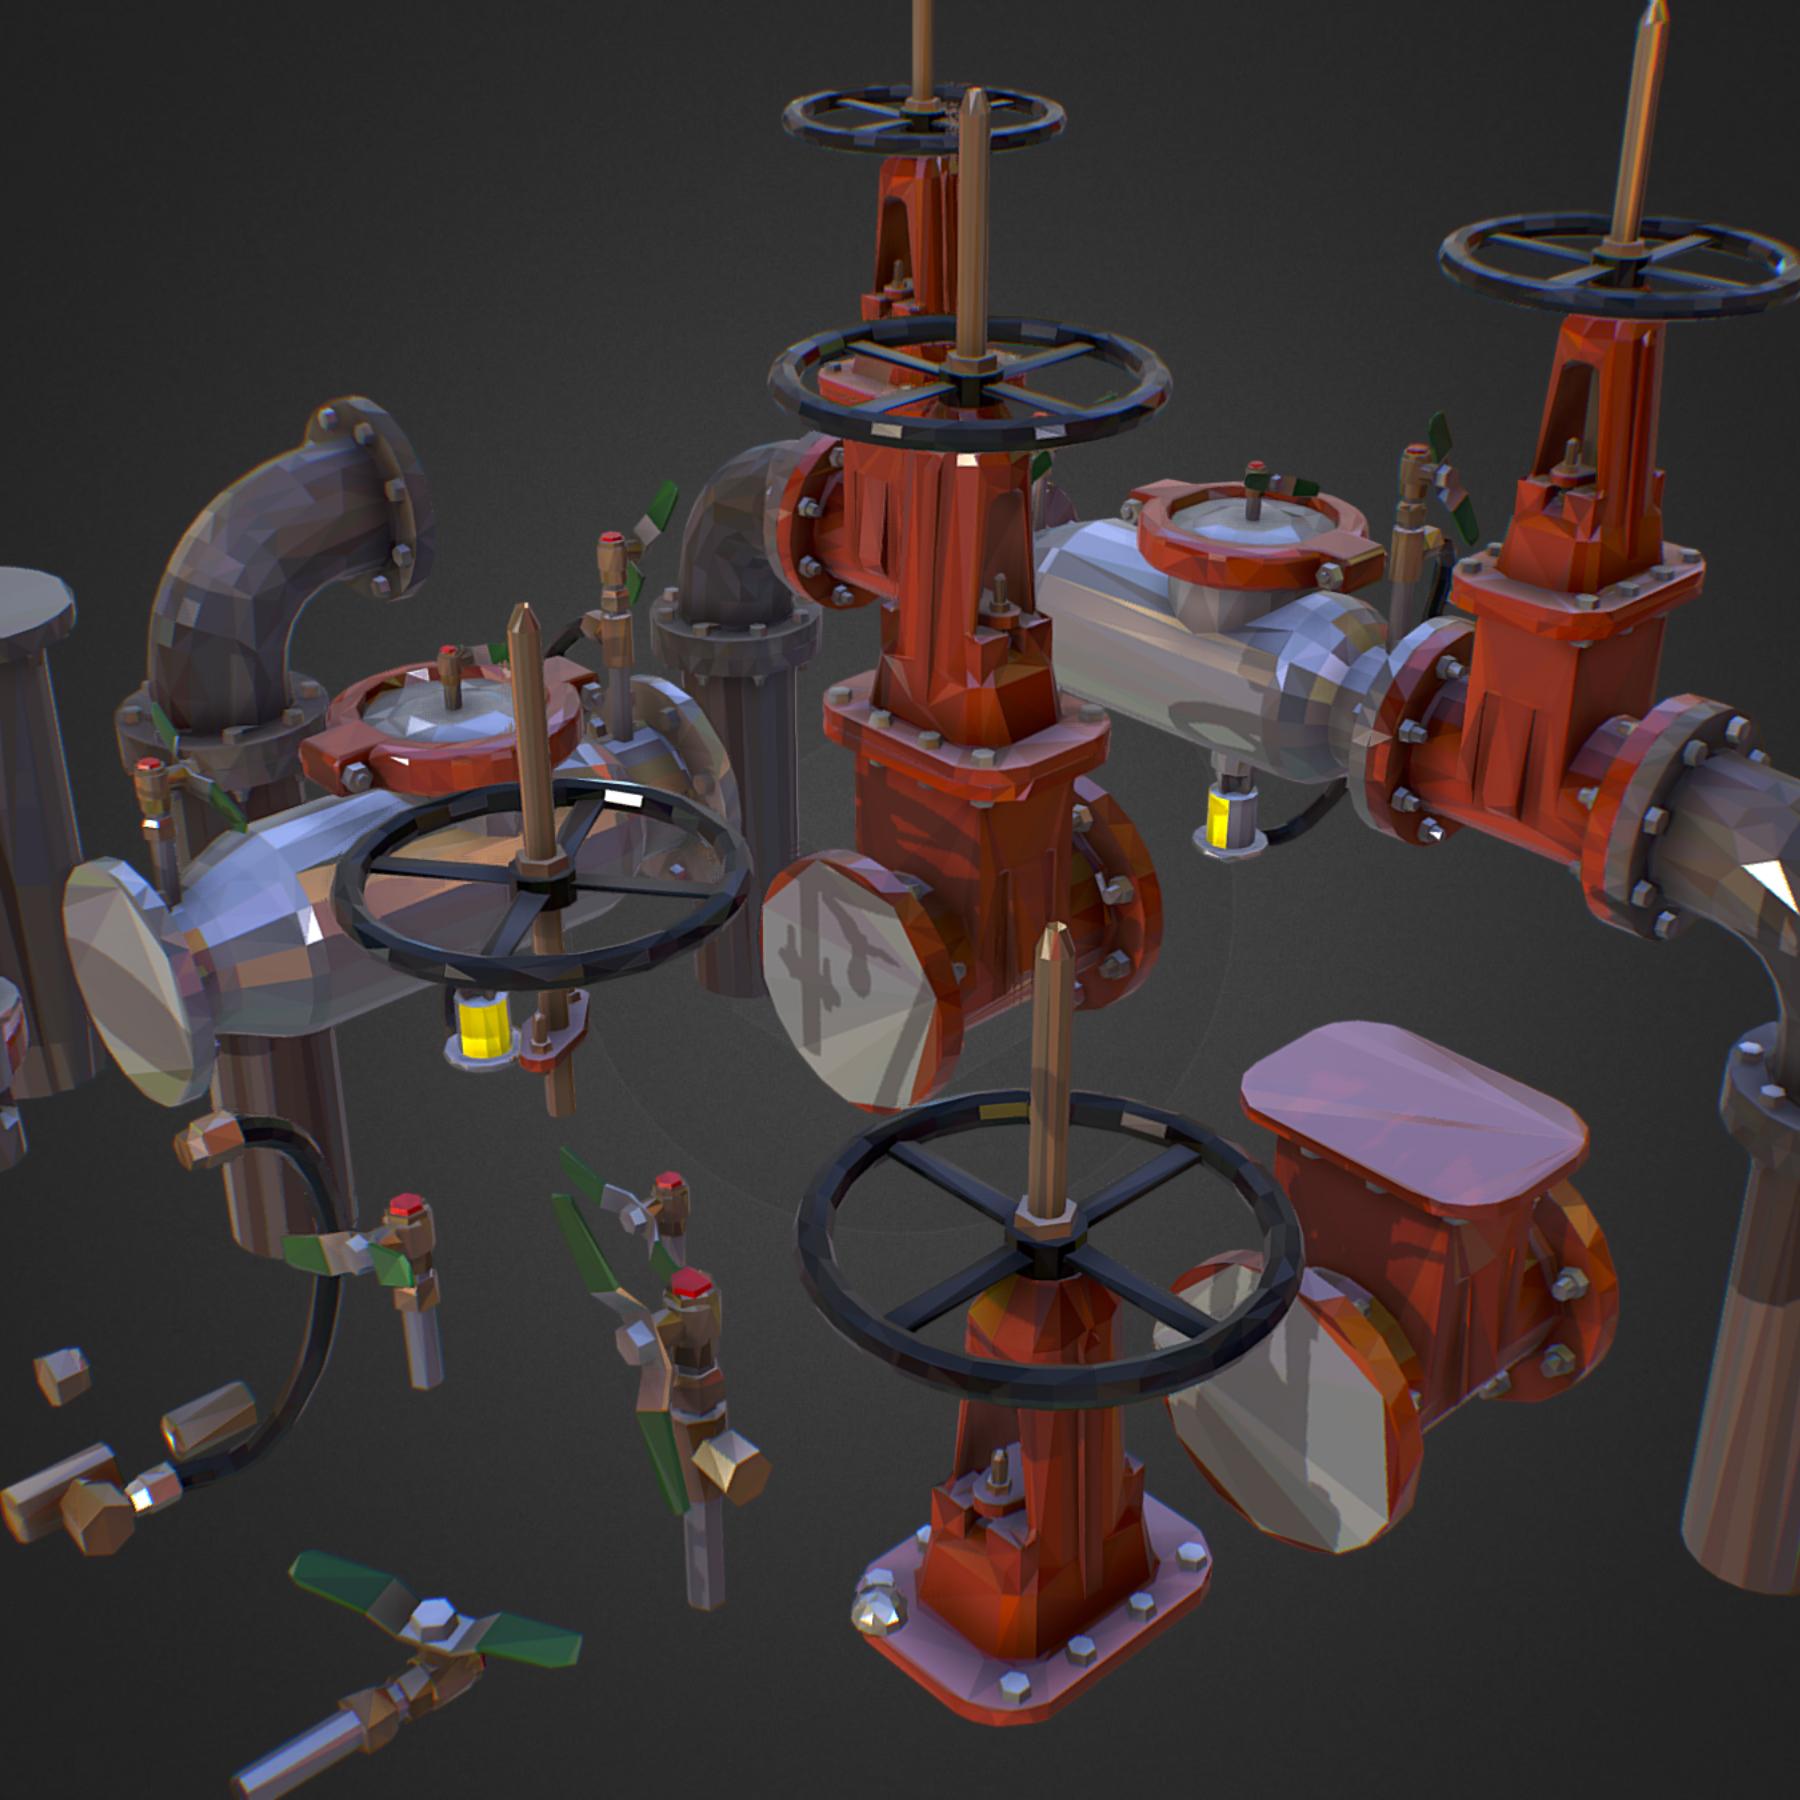 Low Poly ART Backflow Water Pipe Constructor 3d model max 3ds max plugin fbx ma mb tga targa icb vda vst pix obj 272546